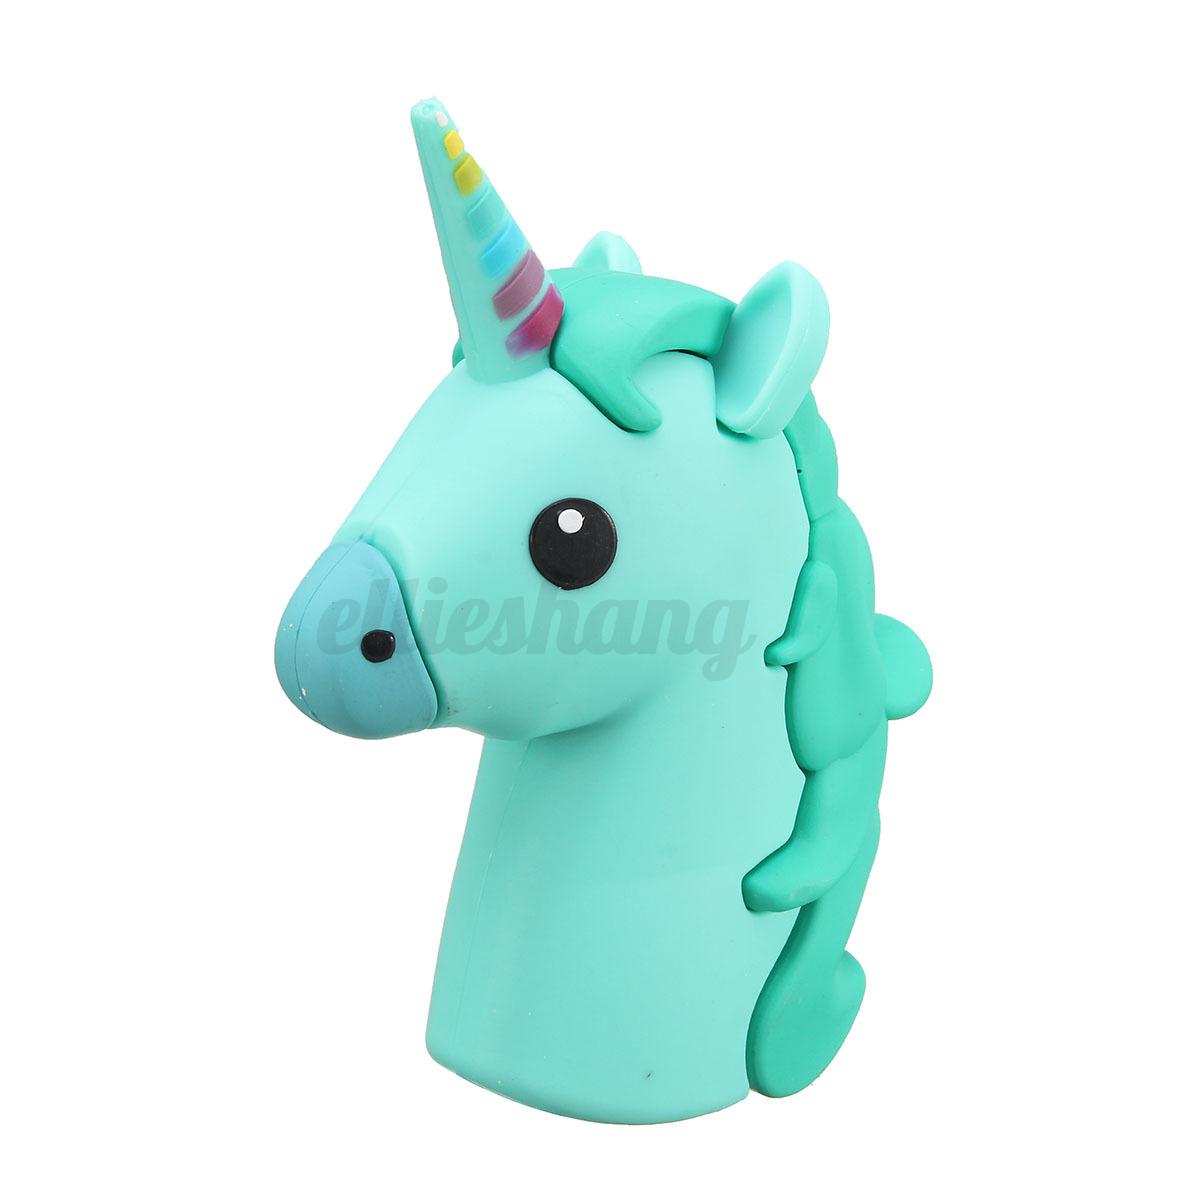 8800mah unicorn cartoon emoji portable phone charger power bank